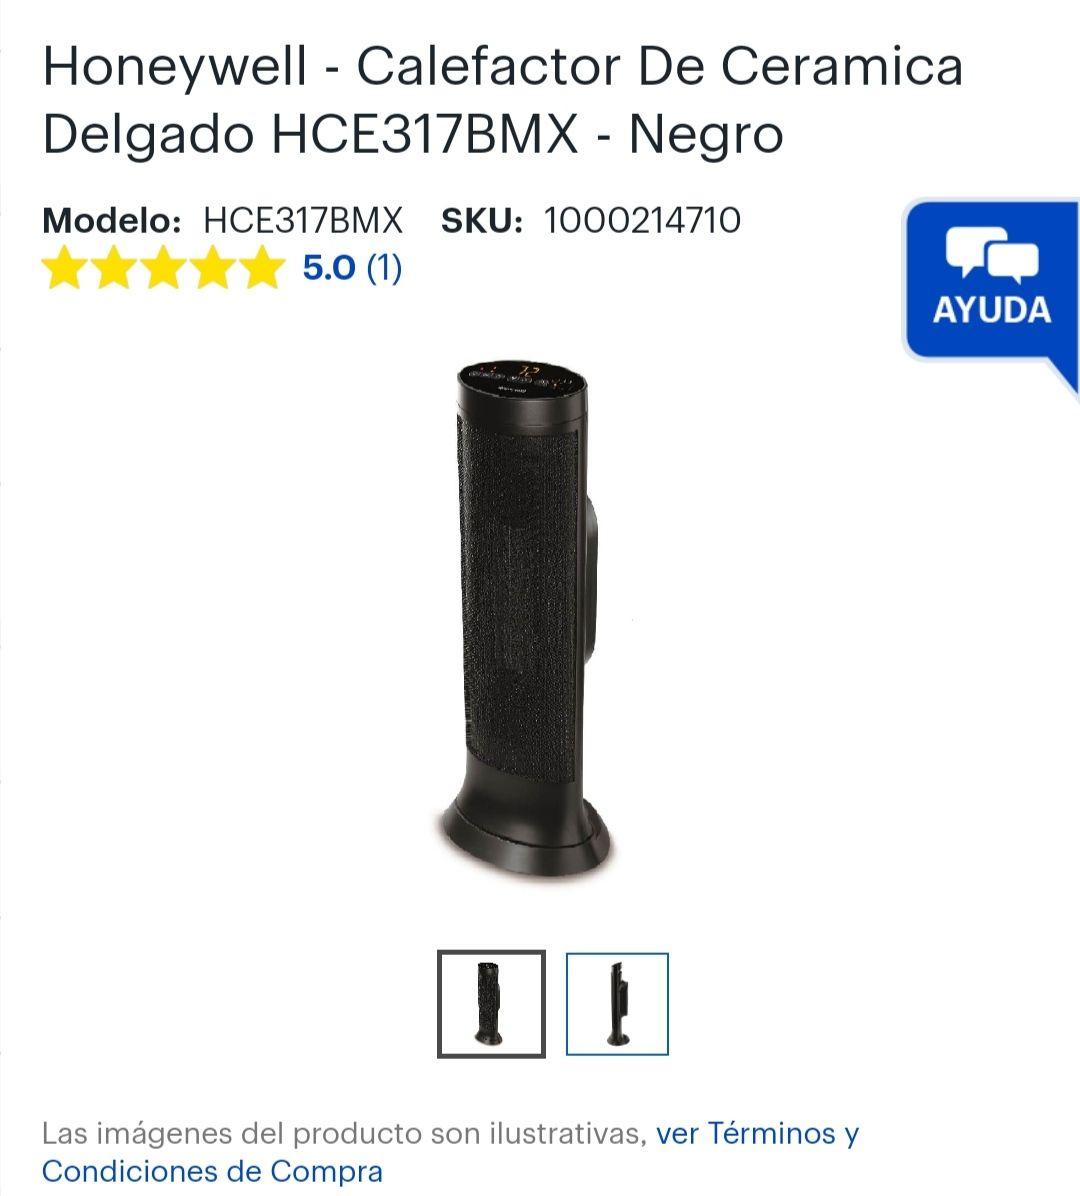 Best Buy: Honeywell - Calefactor De Ceramica Delgado - Negro